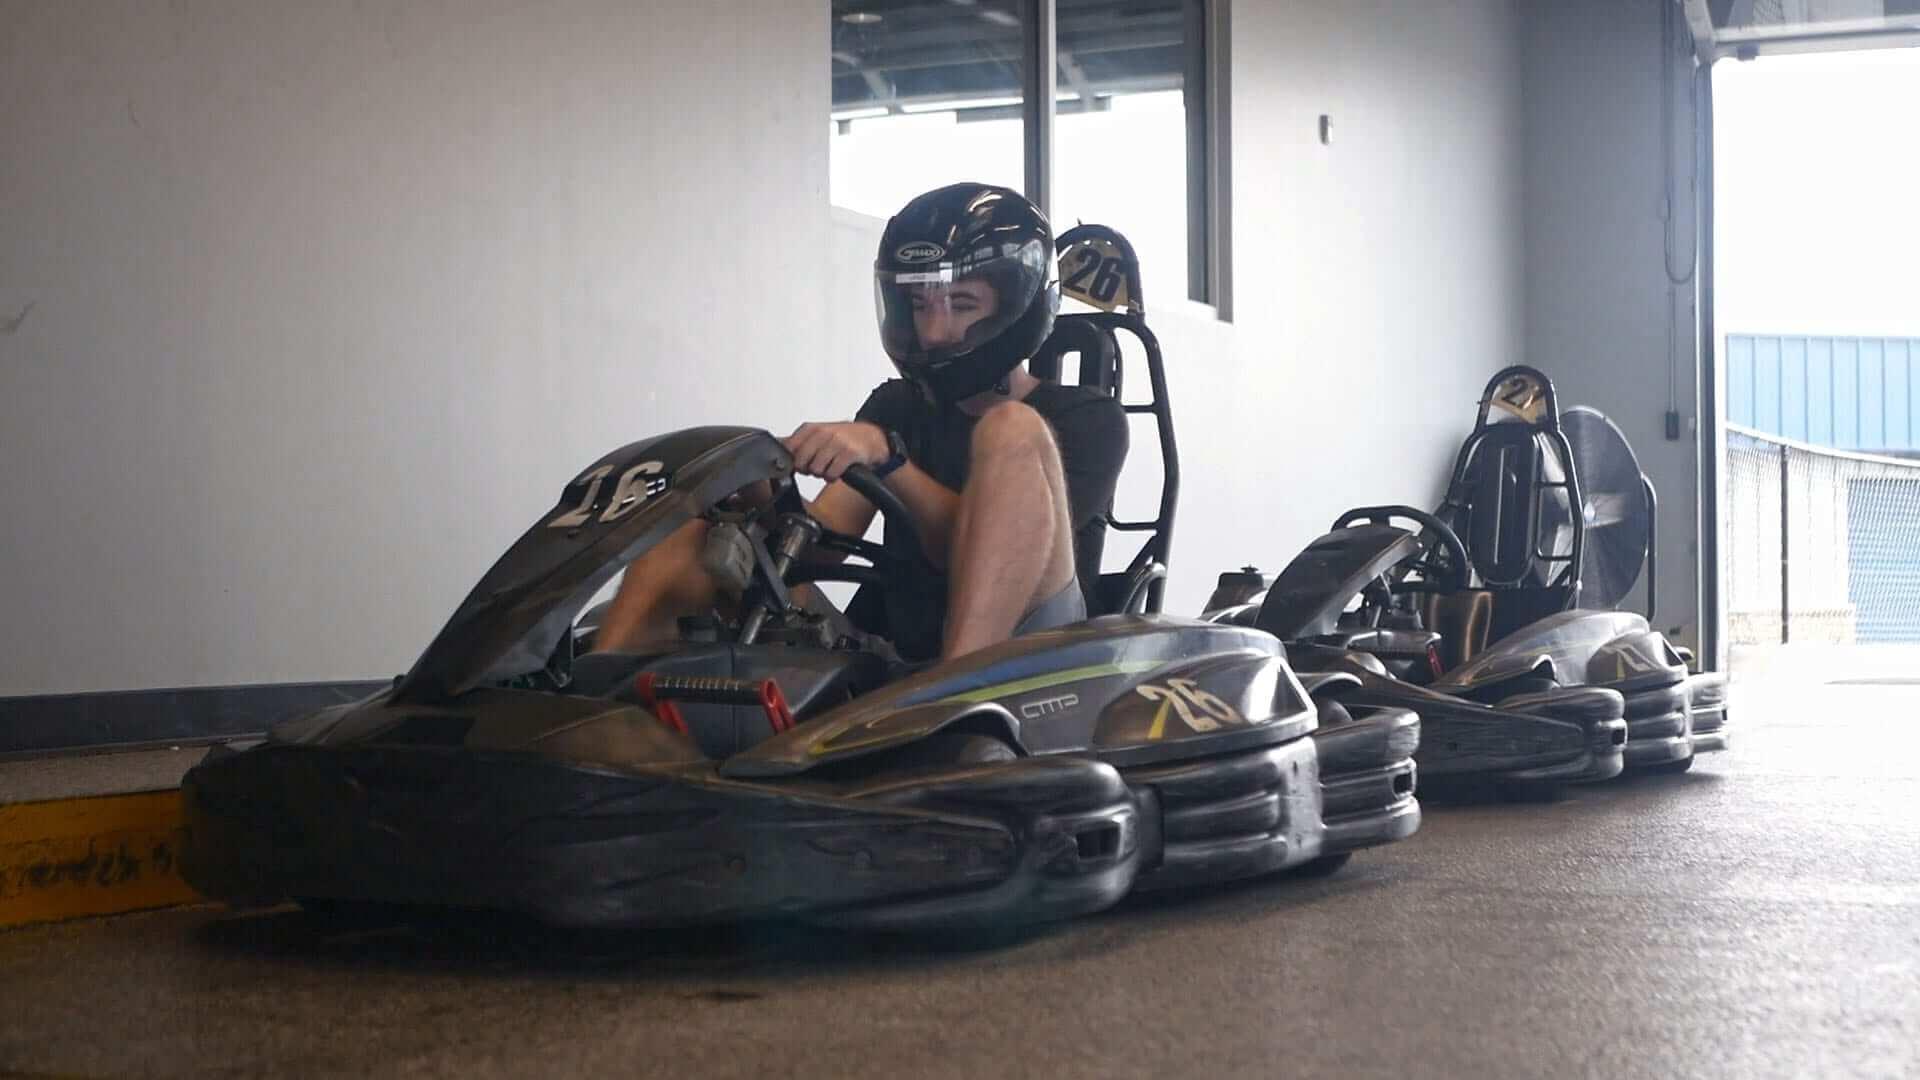 josh 1 1 - Karting First Impressions